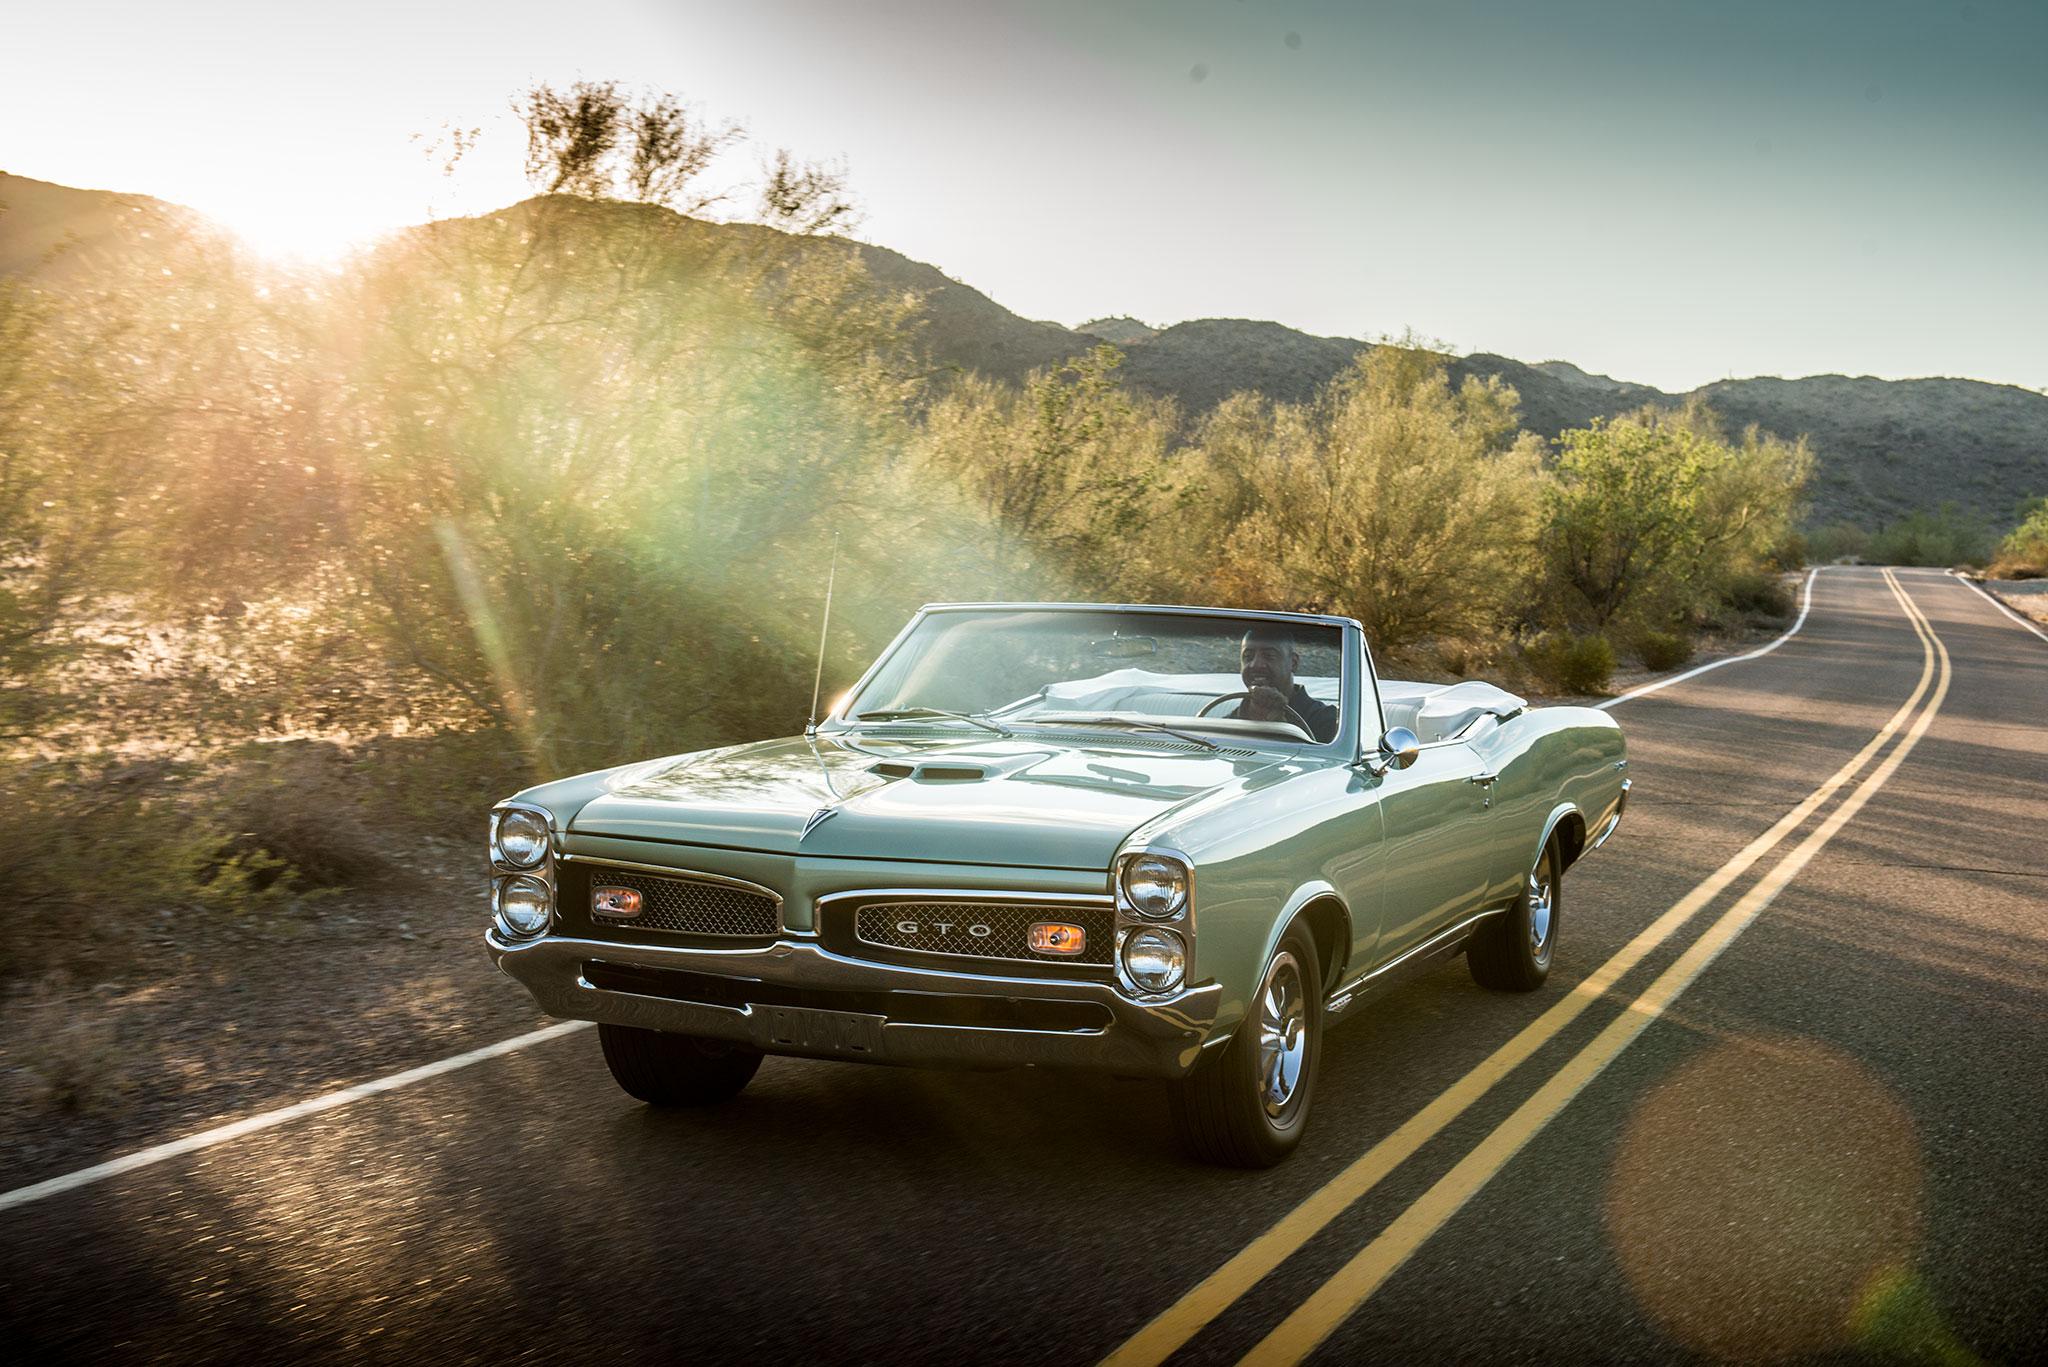 1967 Pontiac GTO convertible desert highway